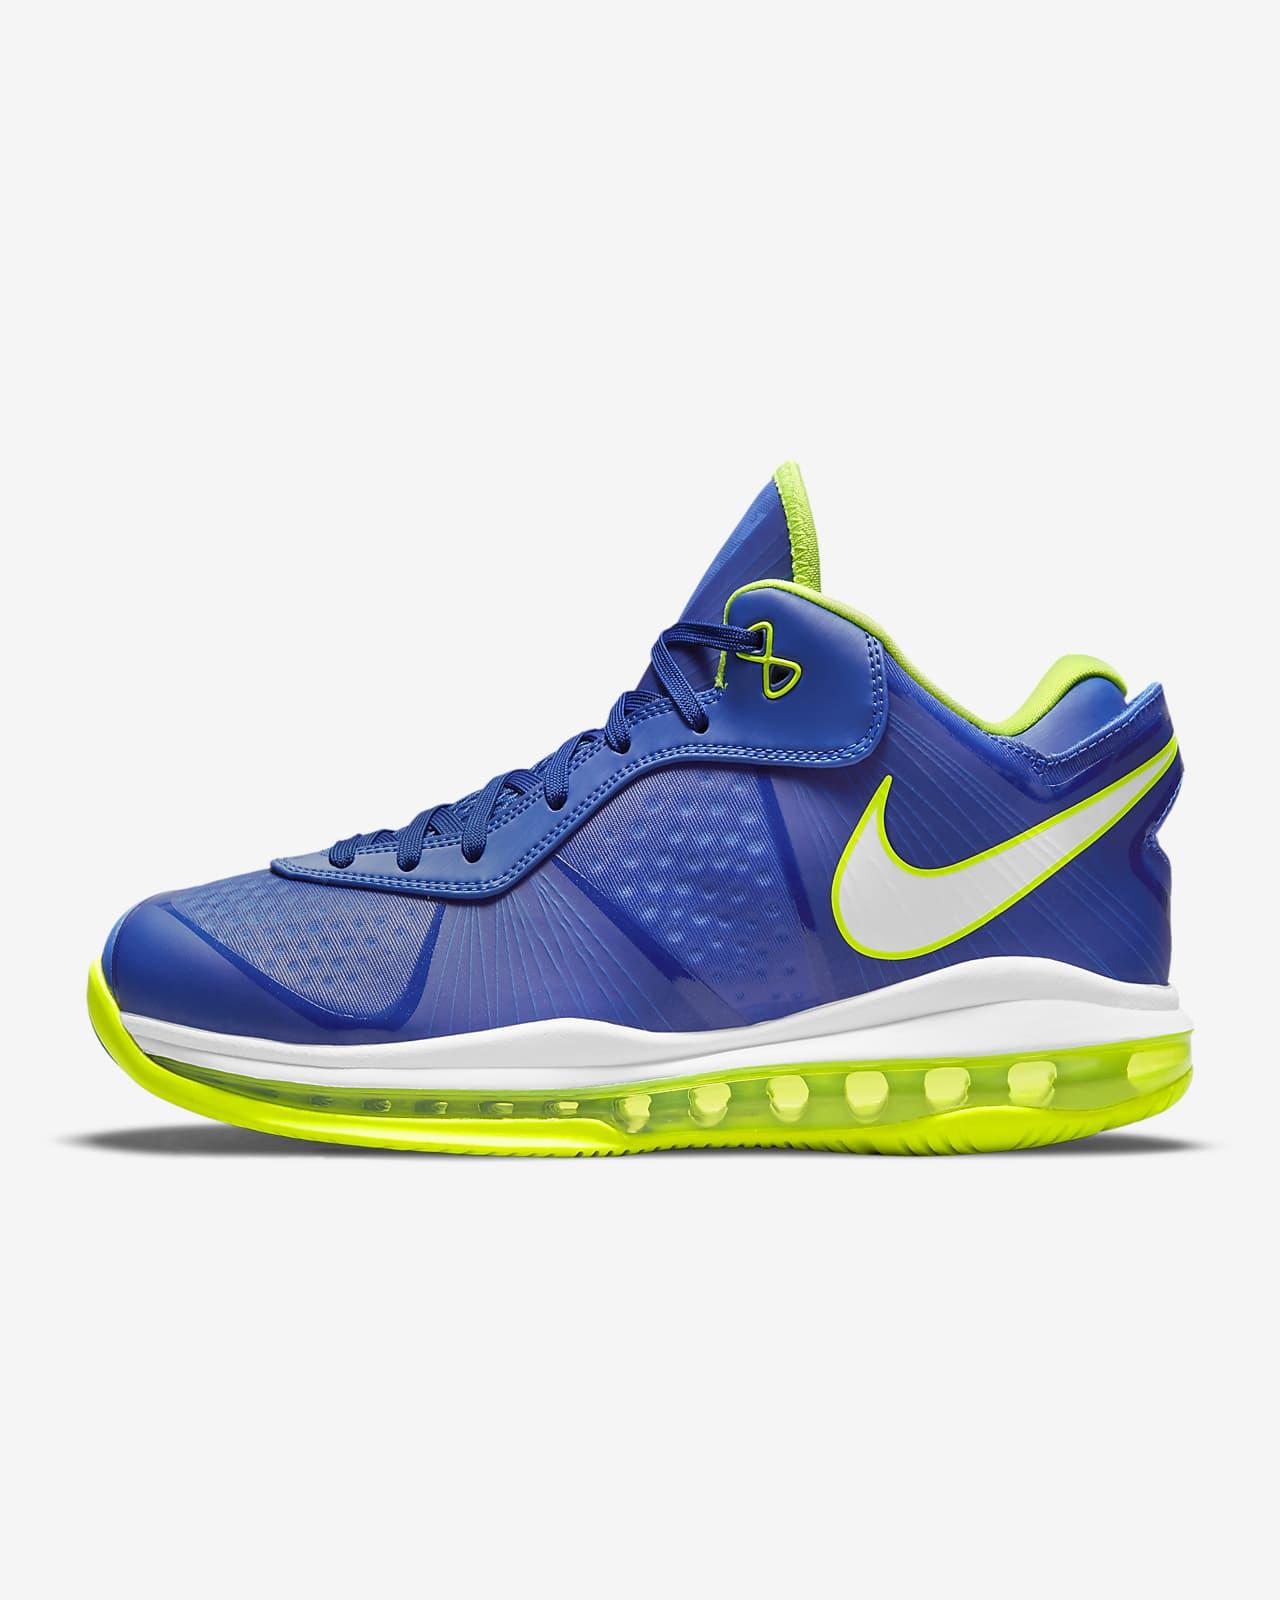 Chaussure Nike LeBron 8 V/2 Low « Treasure Blue ». Nike LU